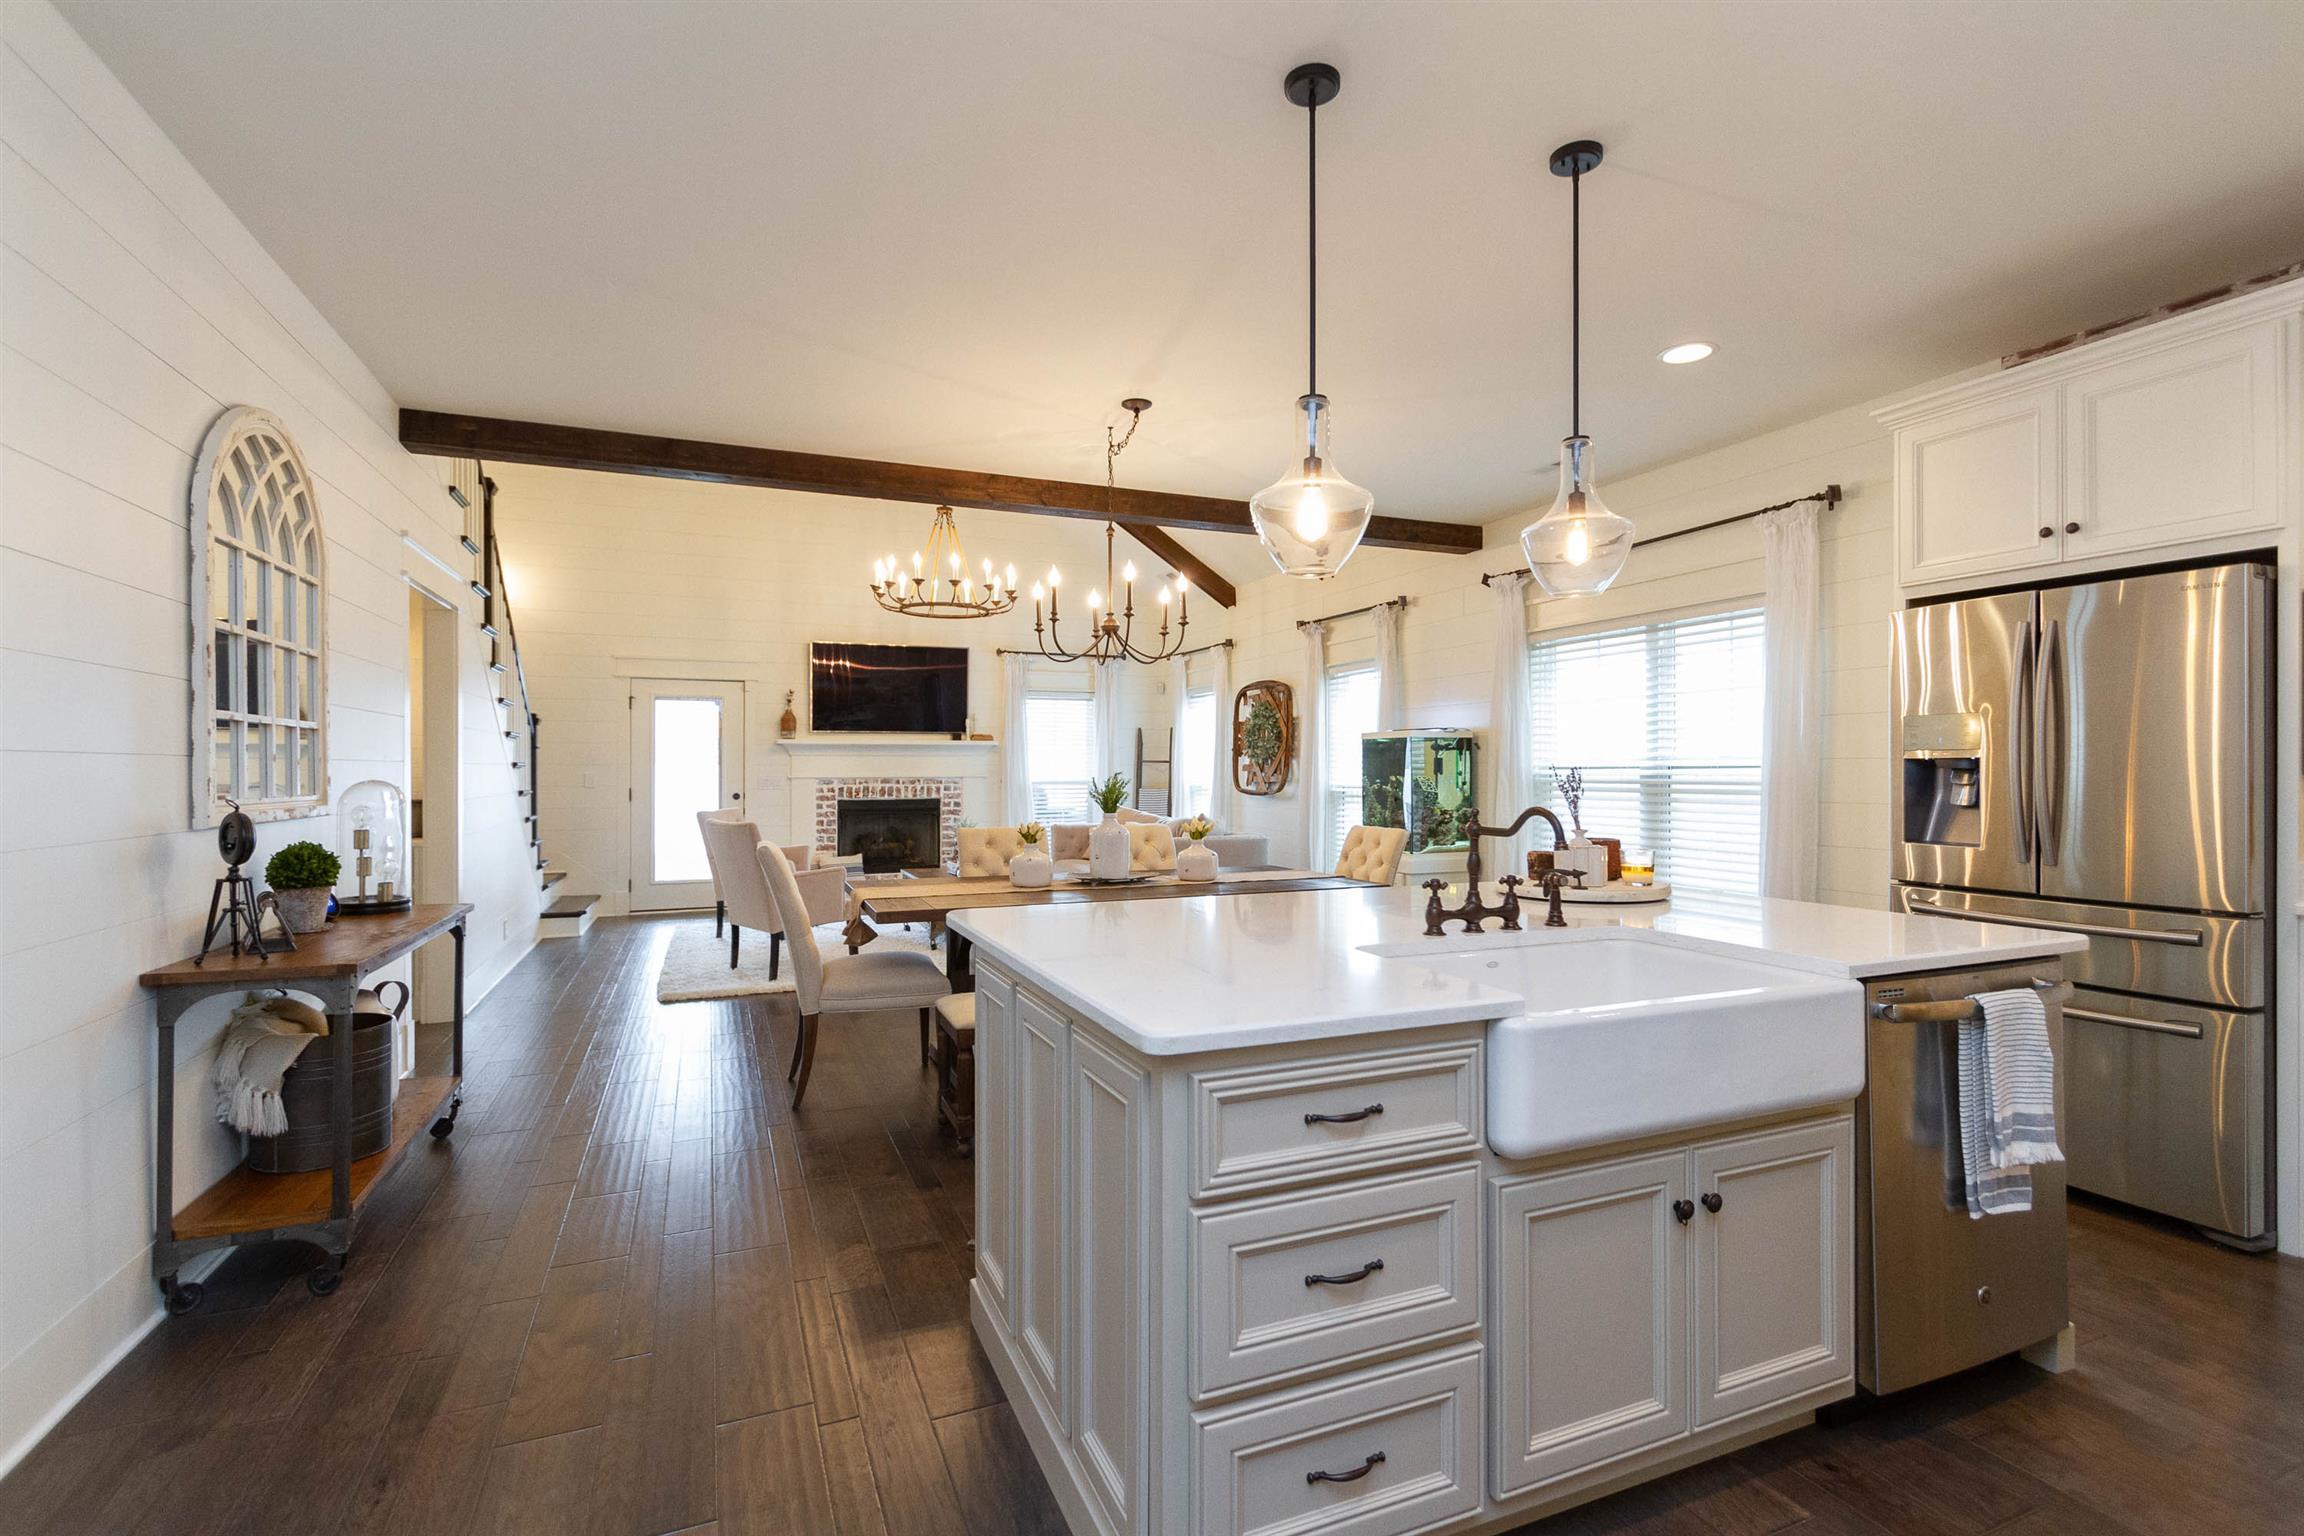 3324 Hampton Turner Dr, Murfreesboro, TN 37128 - Murfreesboro, TN real estate listing